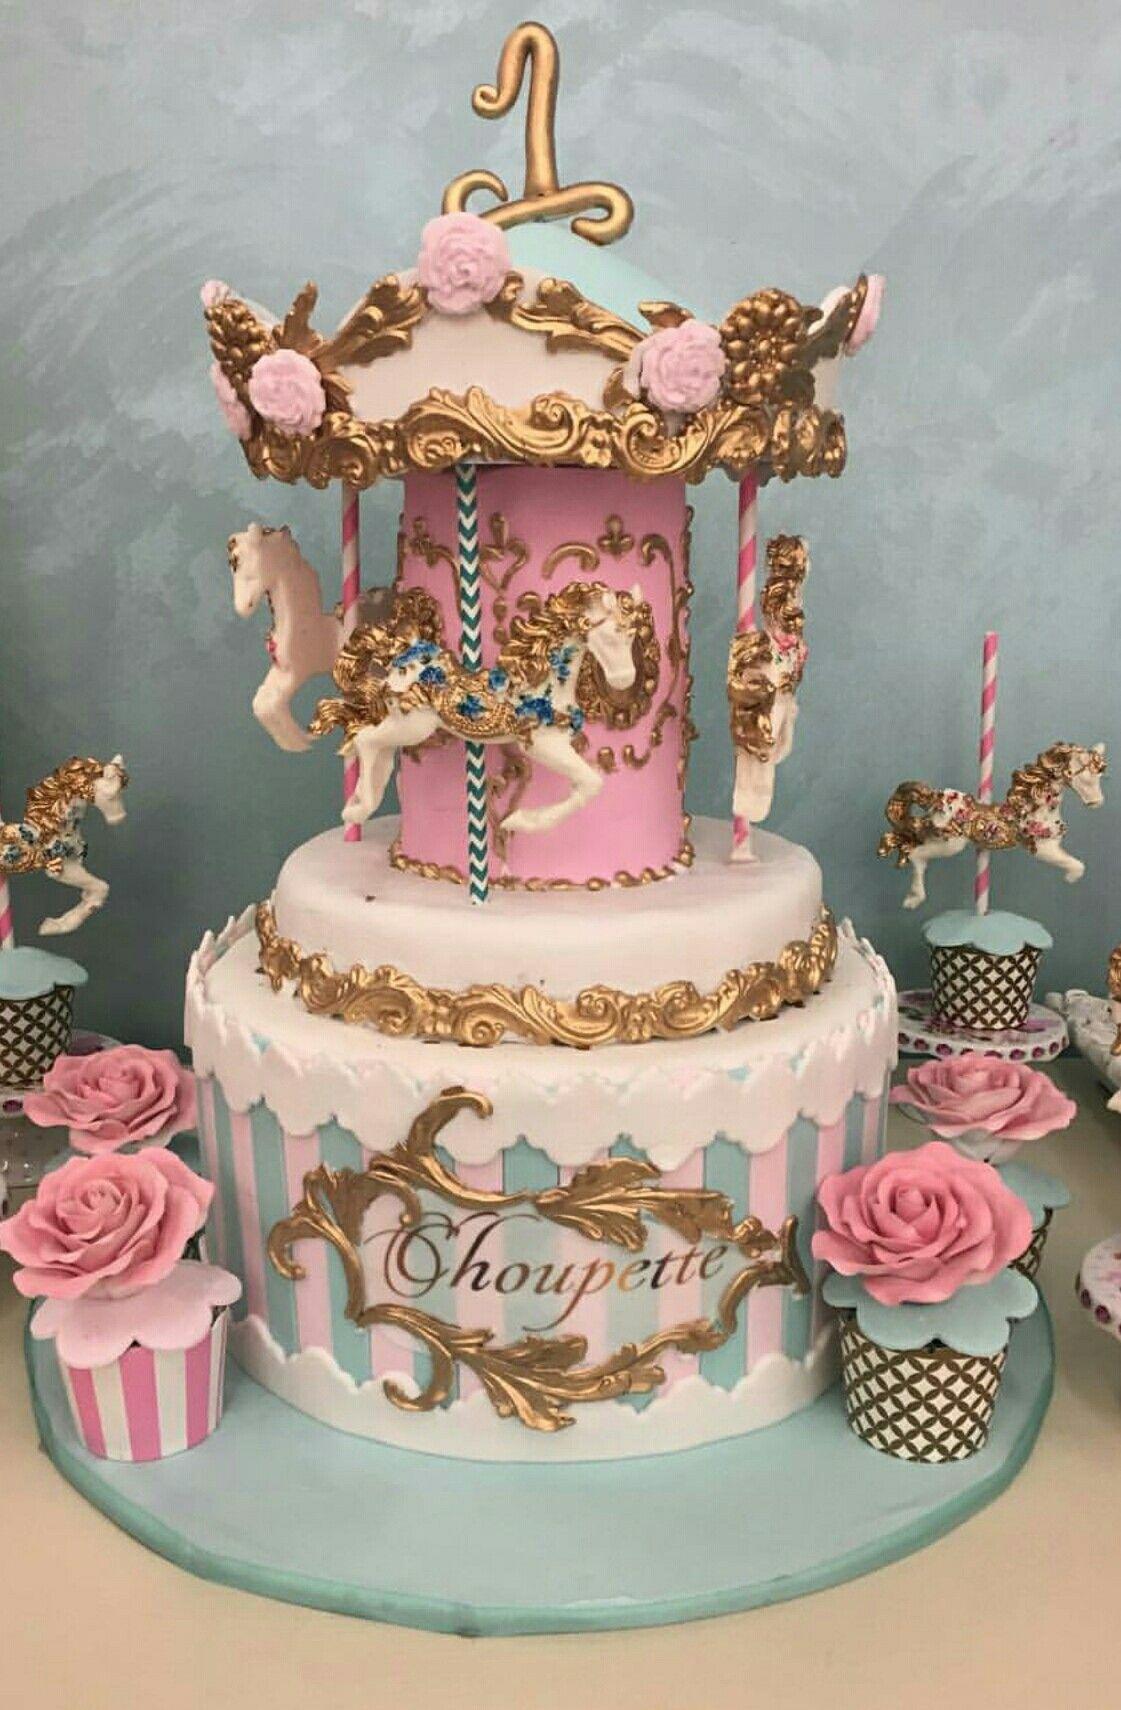 Cake Design Vintage : Vintage carousel cake cakes Pinterest Cakes ...